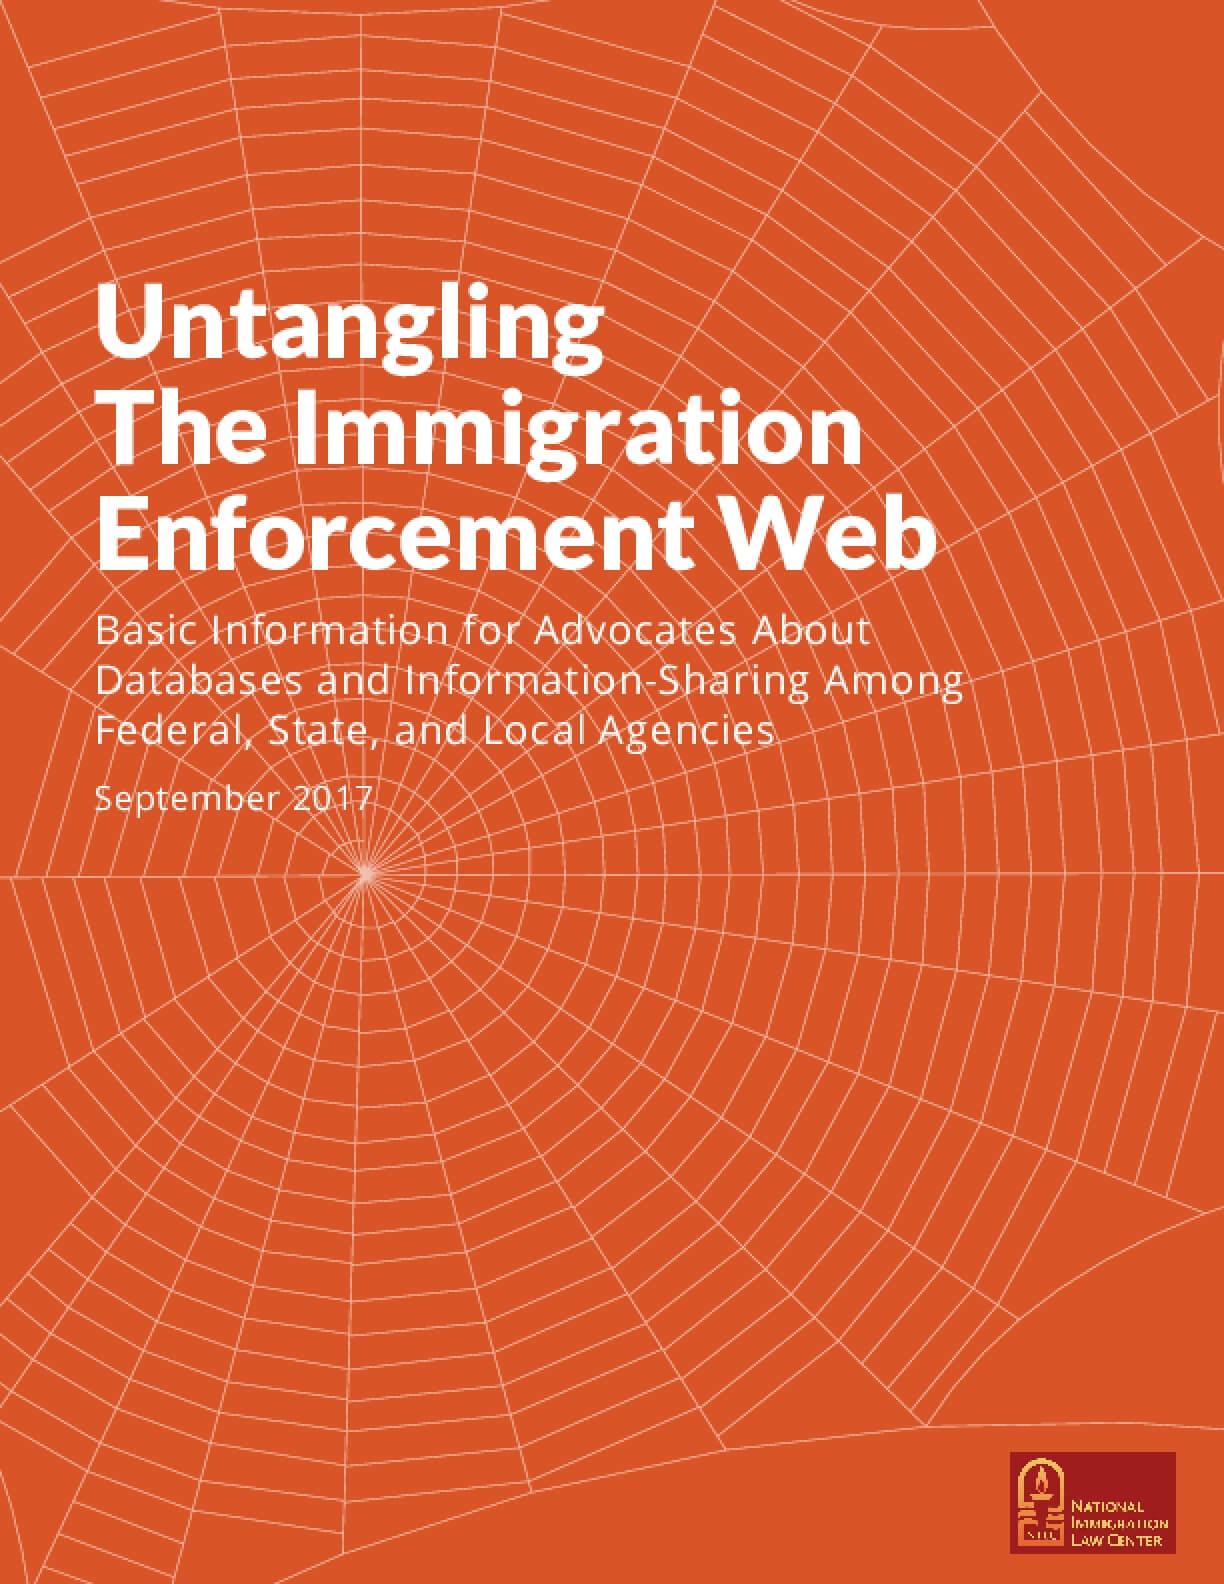 Untangling the Immigration Enforcement Web